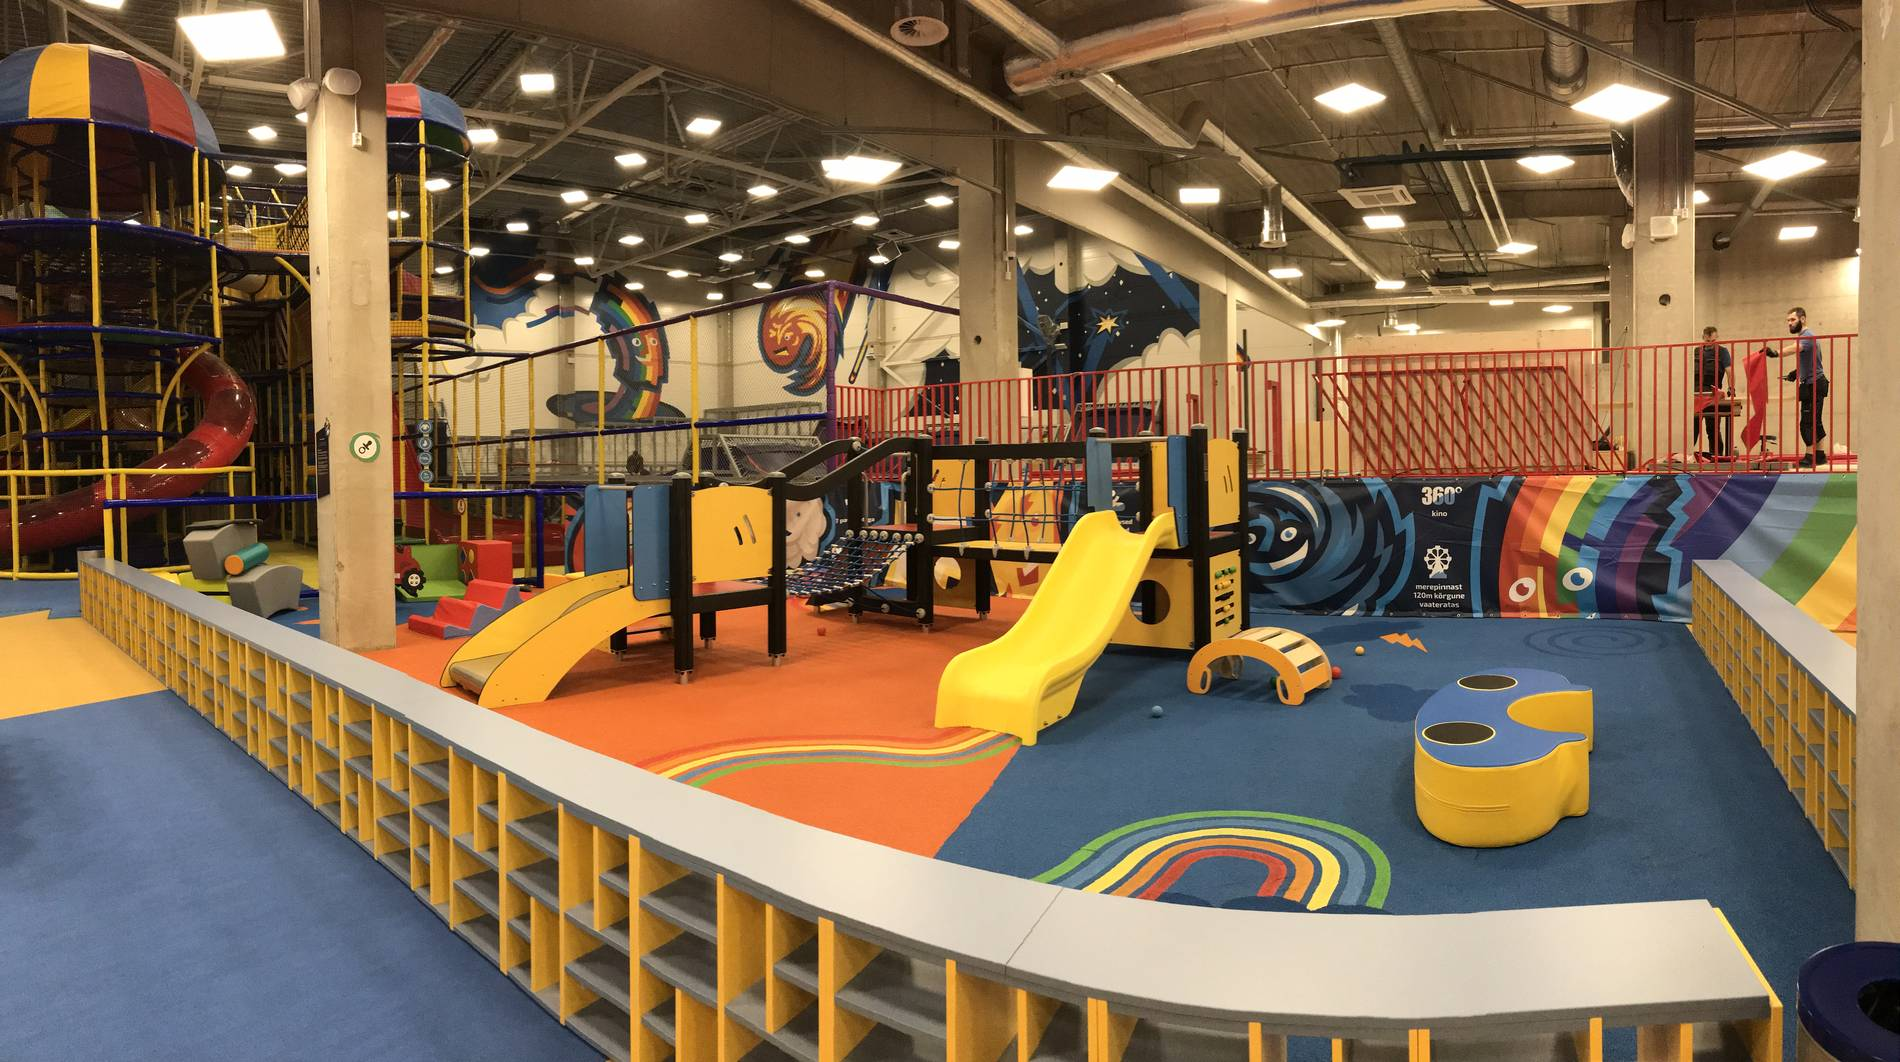 Super Skypark trampoline and playcenter